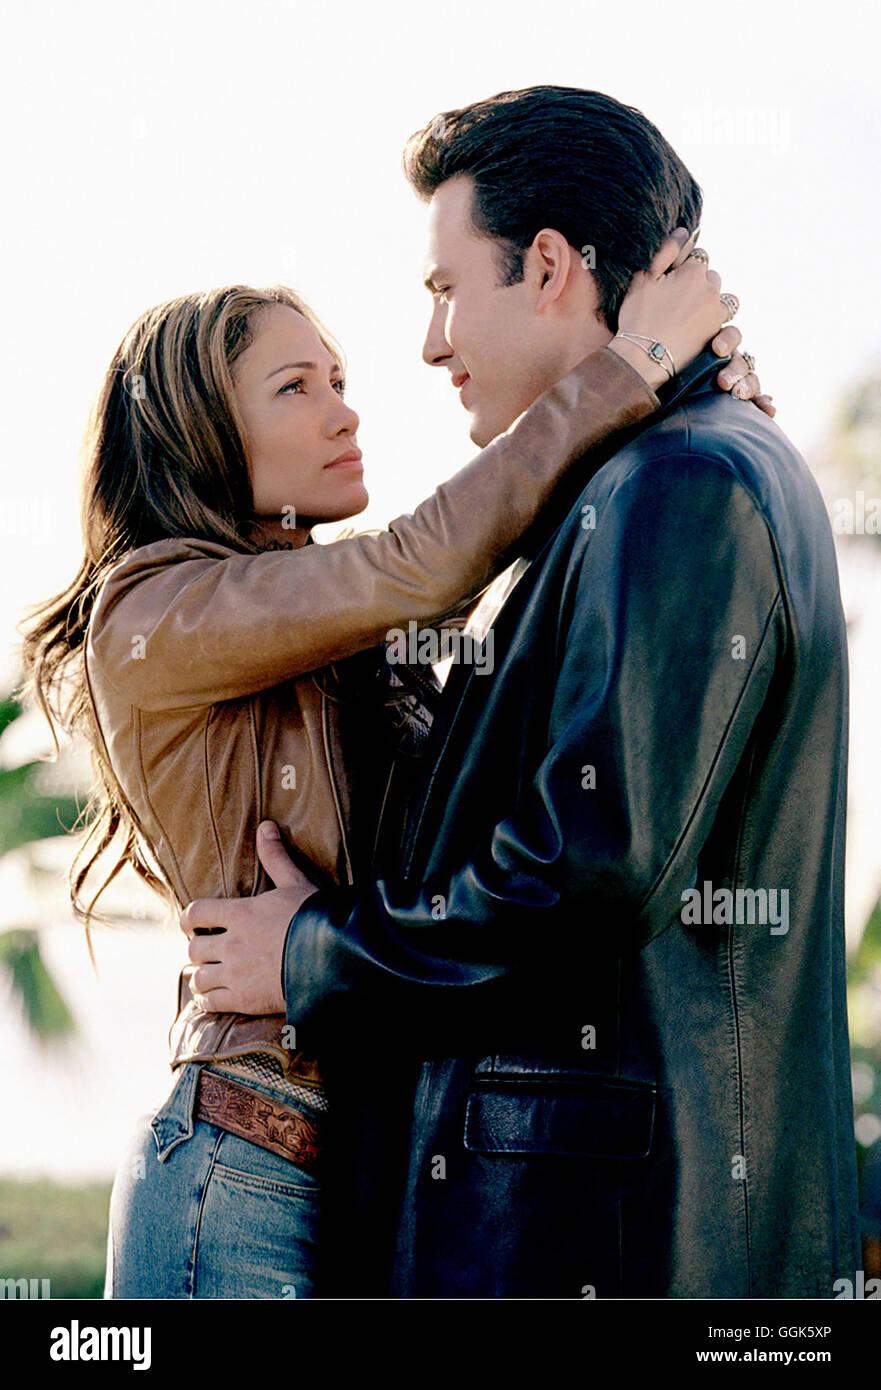 Liebe Mit Risiko Gigli Gigli Usa 2003 Martin Brest Ricki